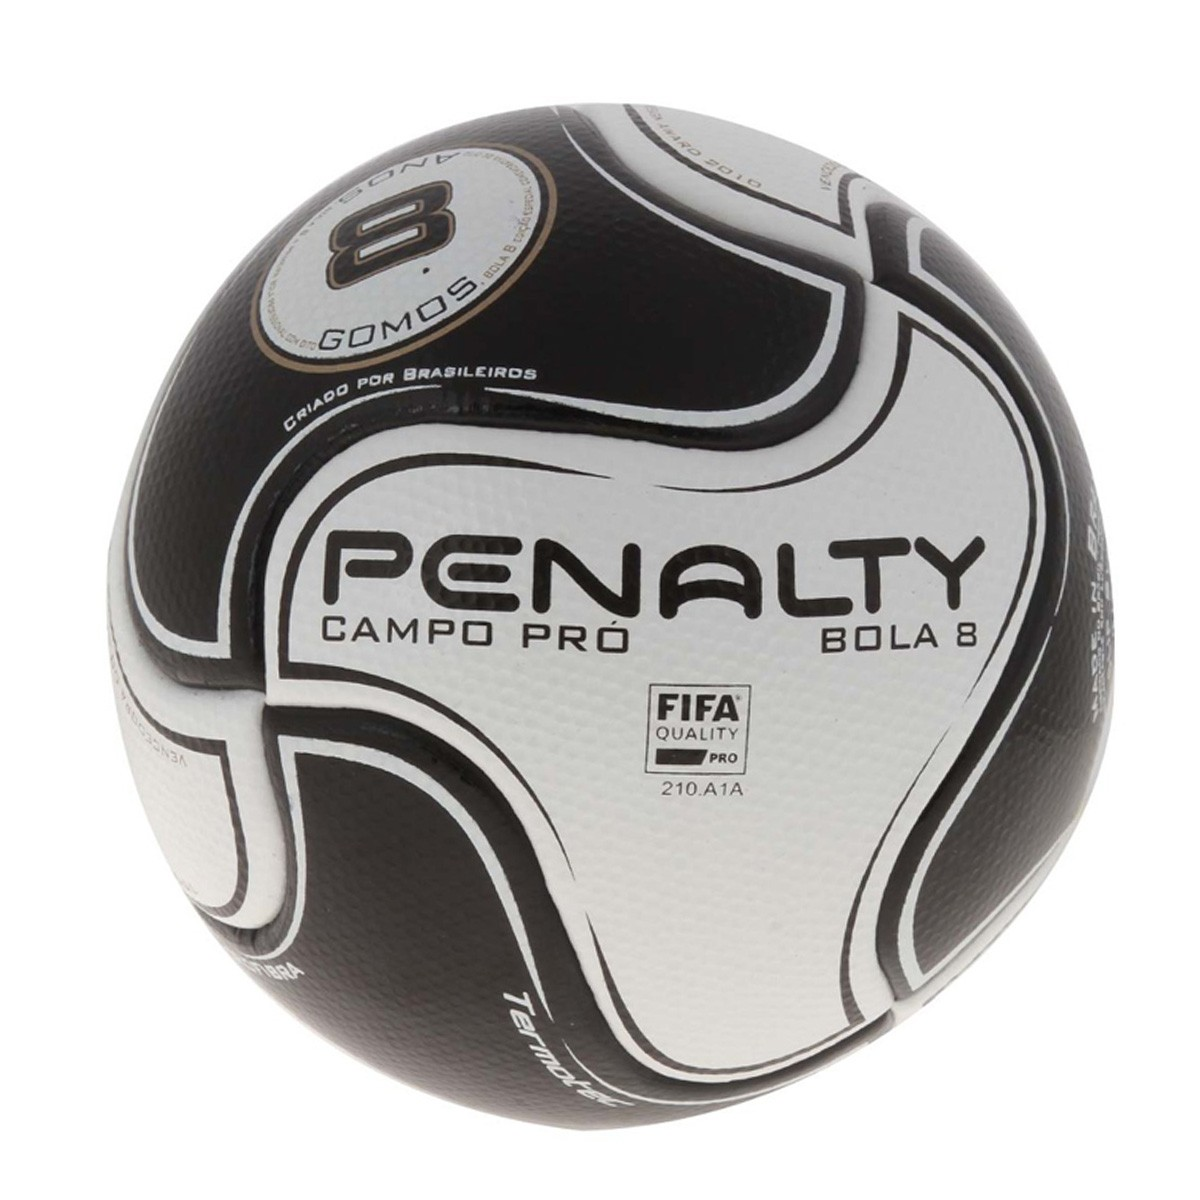 403313b7d3a73 Bola S11 Pro VI Penalty Campo 541383-1110 - Branco Preto - Botas ...